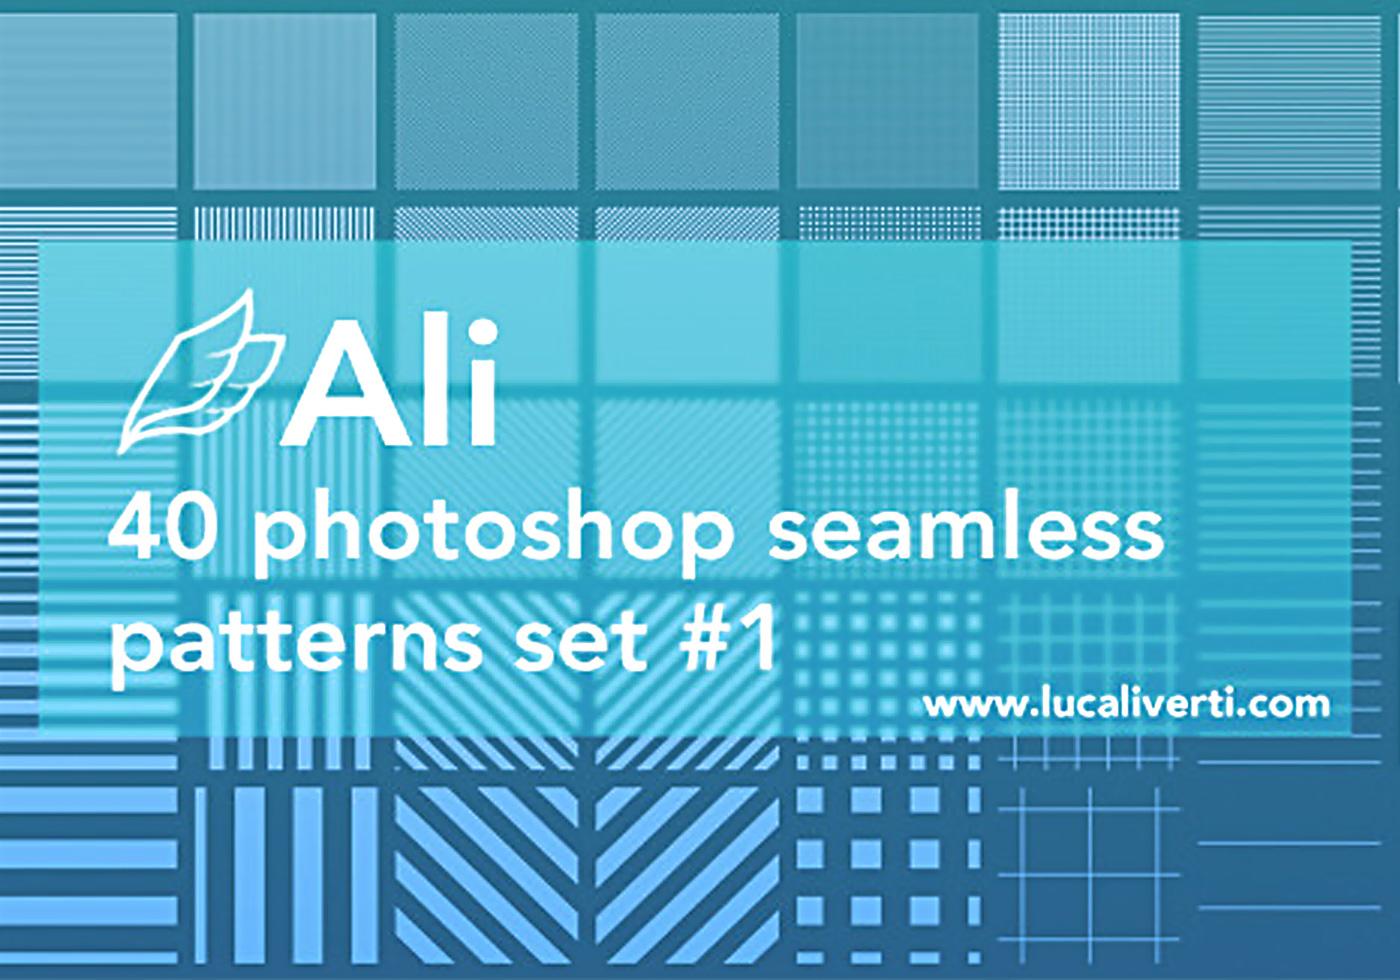 Ali 40 Photoshop seamless patterns set #1 - Free Photoshop